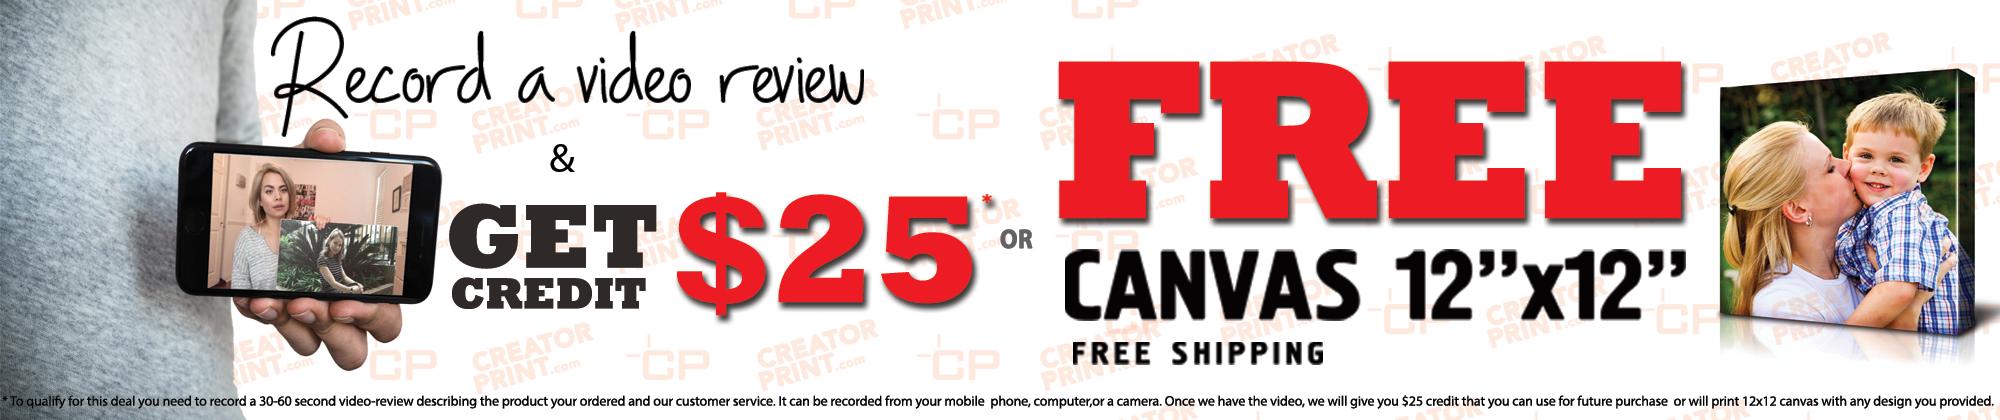 web-banner-GET25$.png